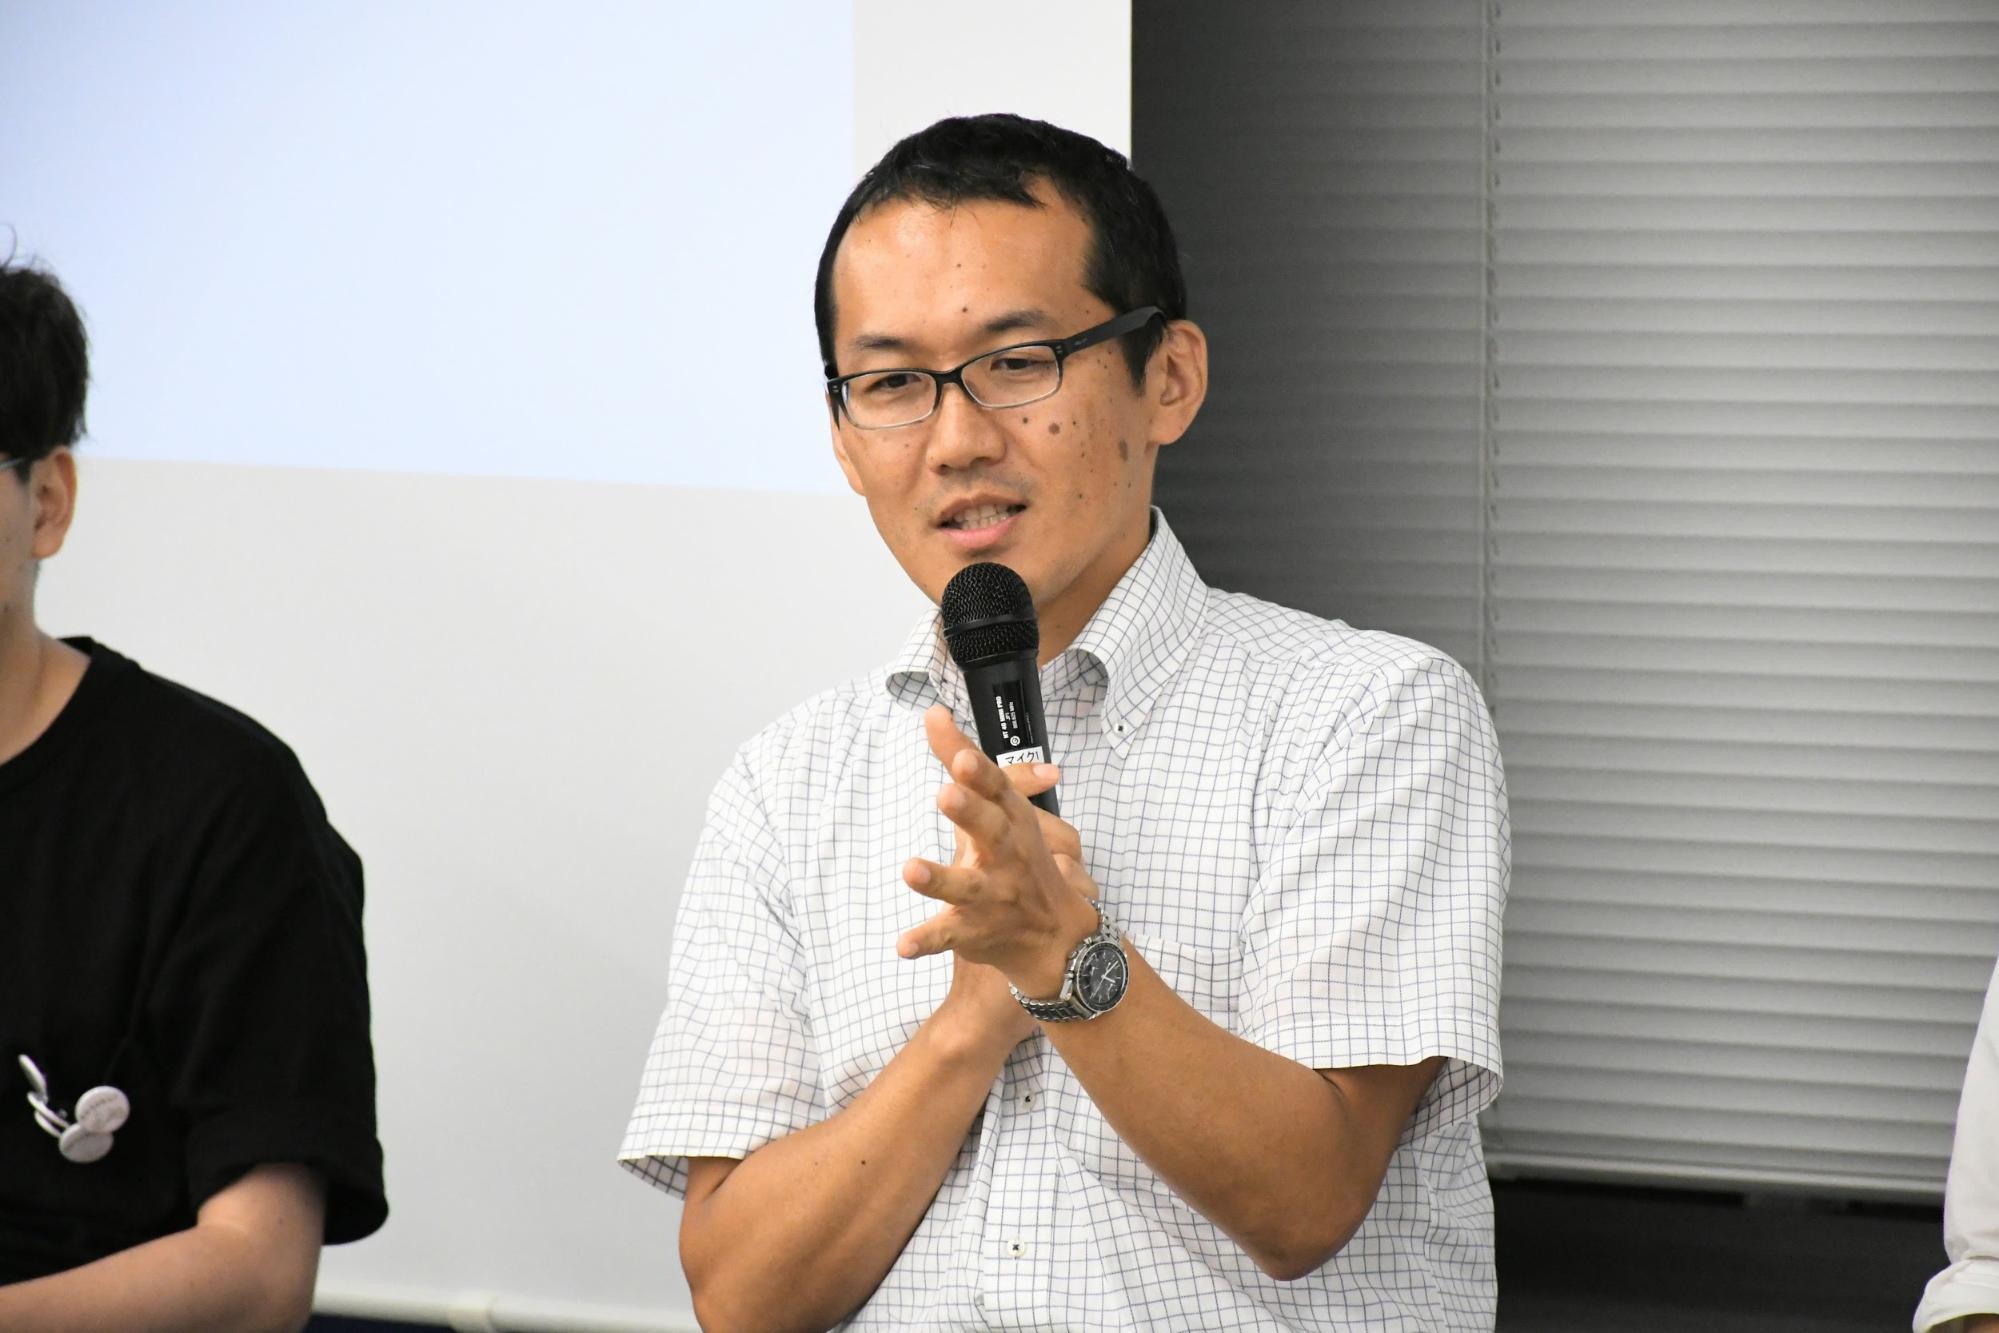 グリー株式会社・入山真一氏